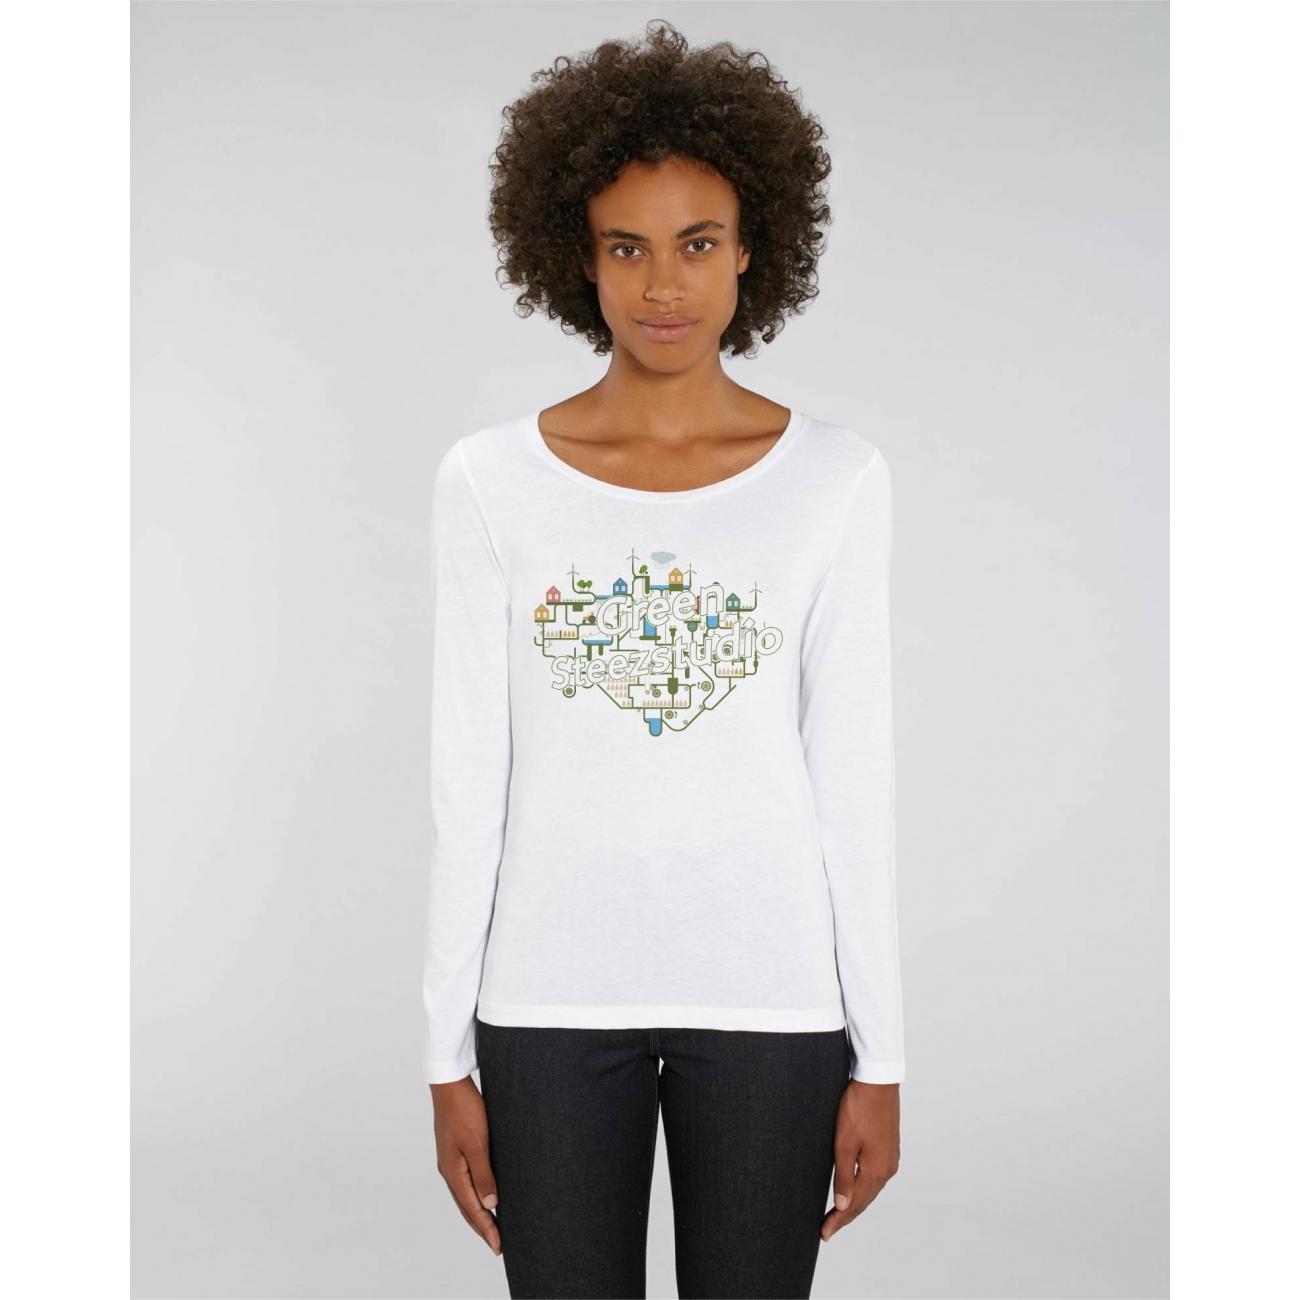 https://tee-shirt-bio.com/9216-thickbox_default/tee-shirt-femme-manches-longues-coton-bio-equitable-blanc-doux-et-leger-visuel-ecolo-green.jpg